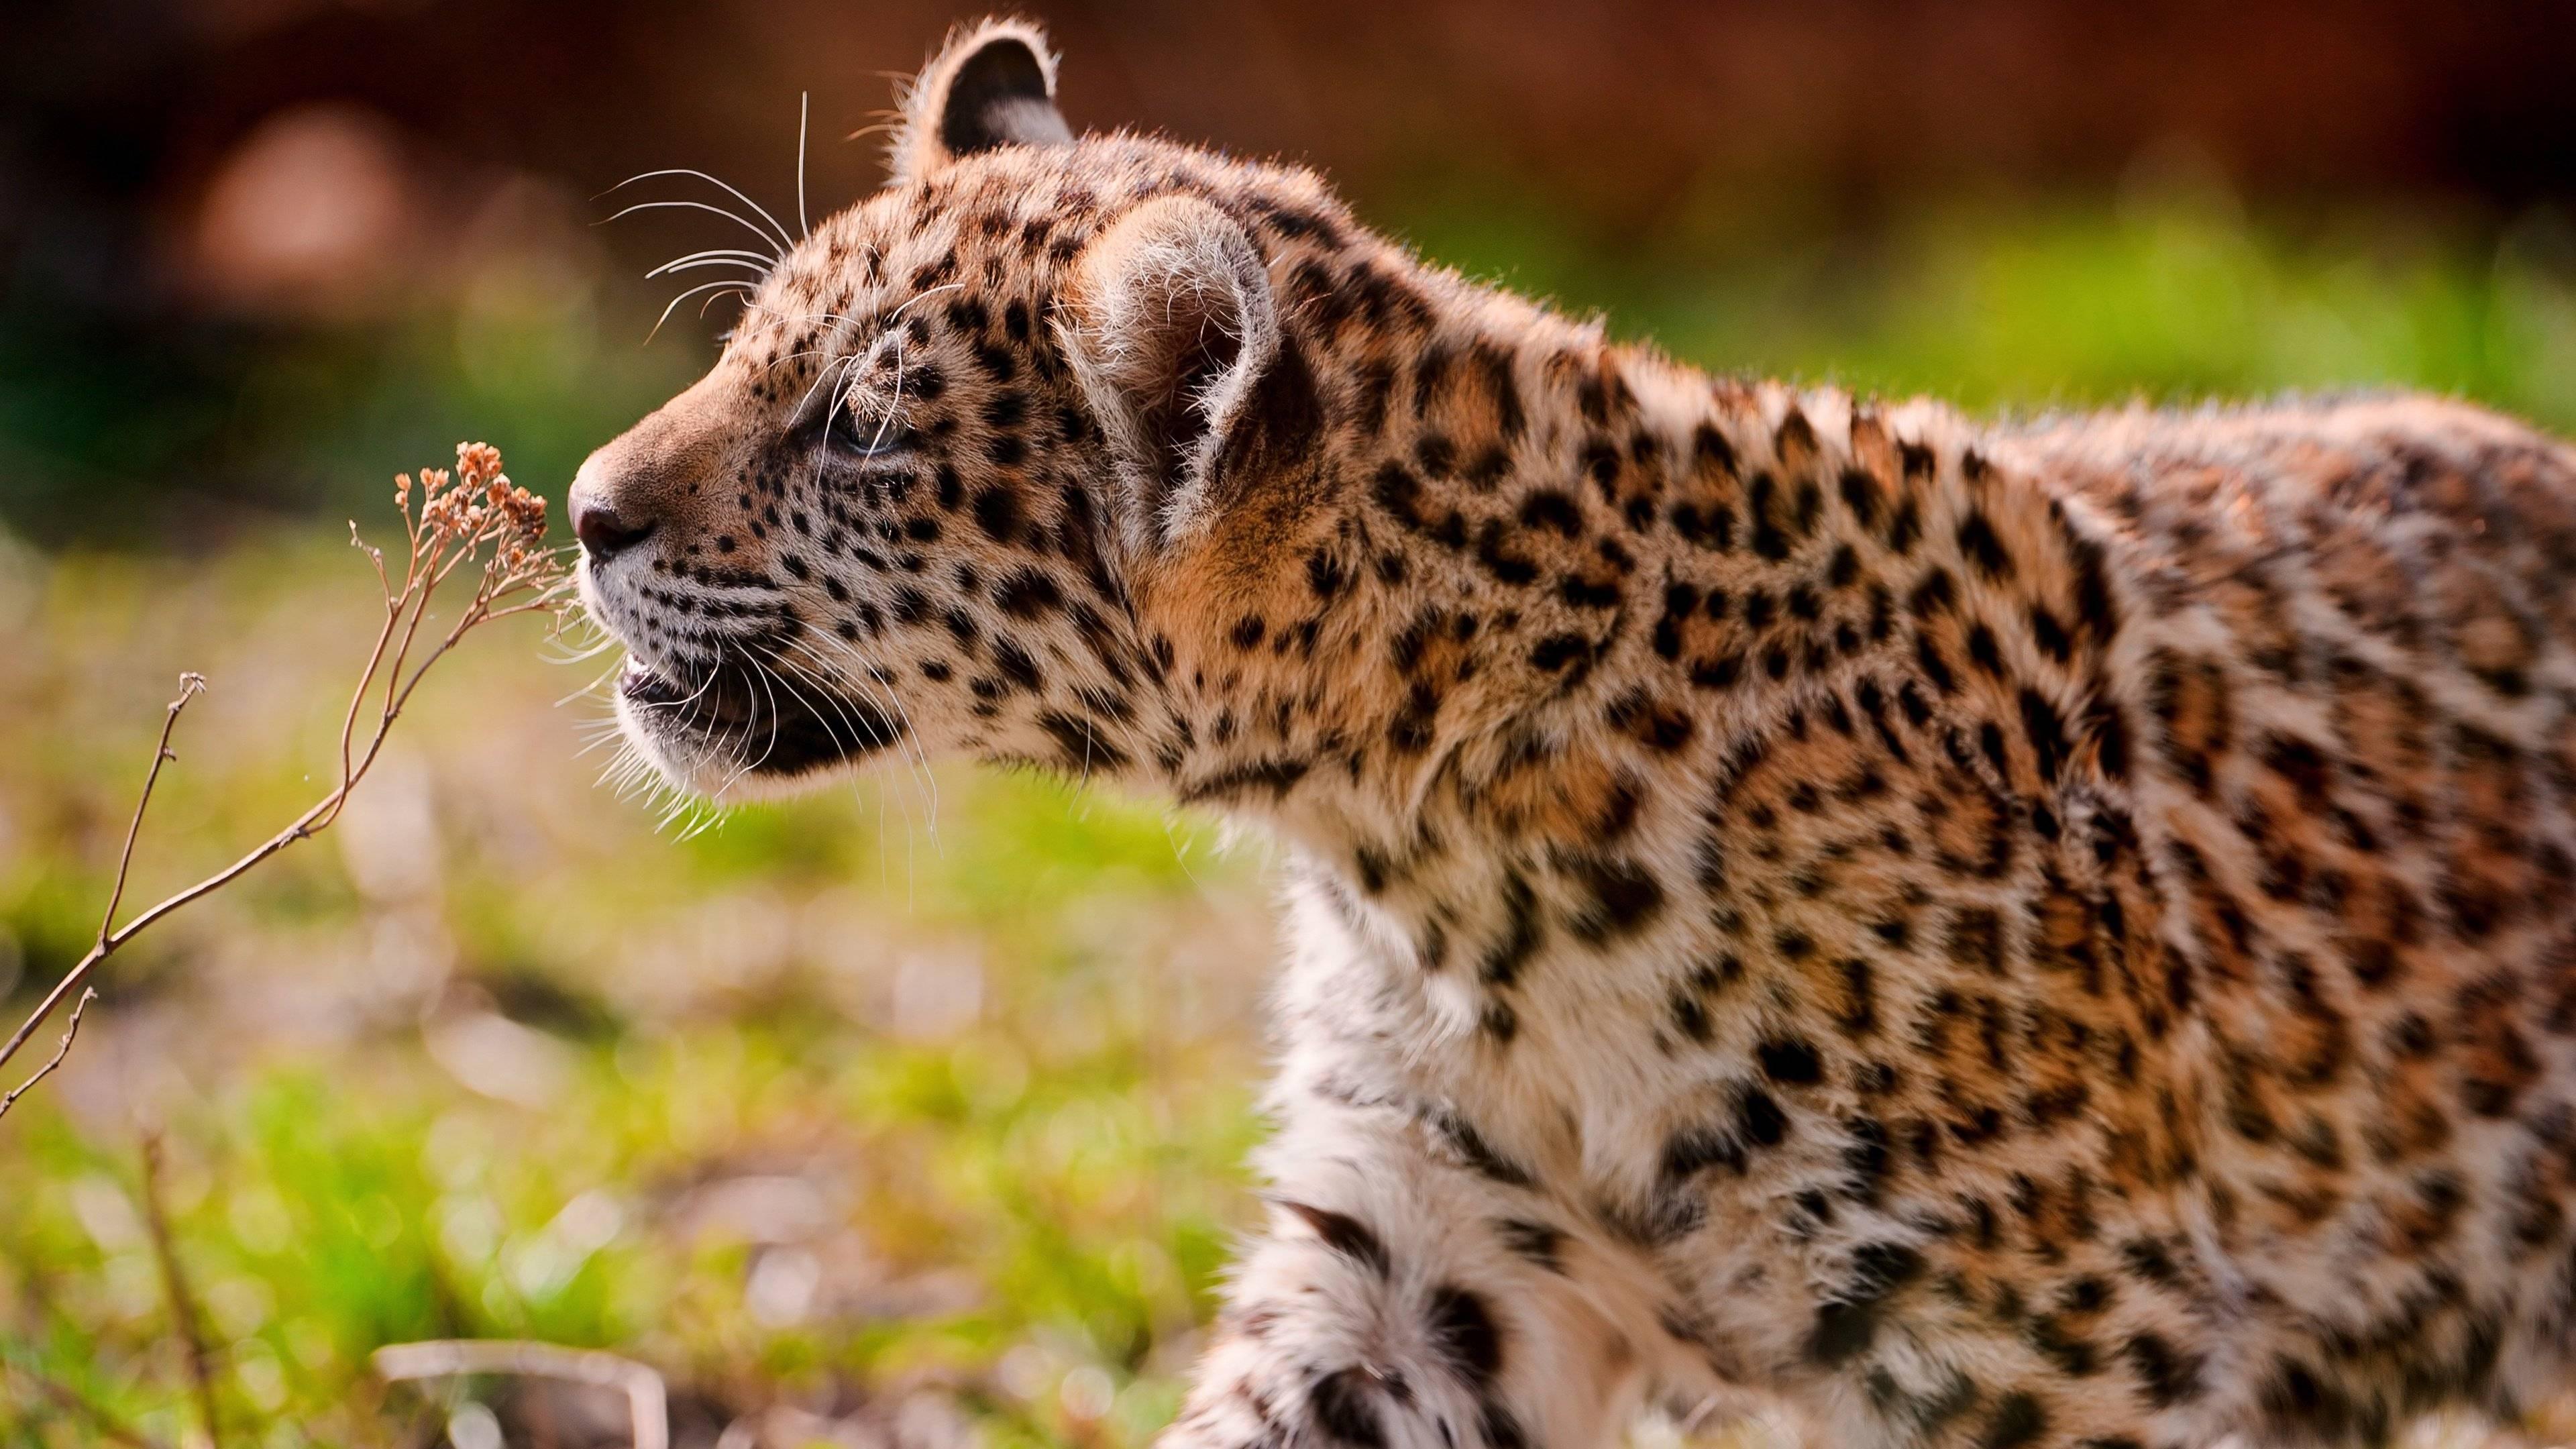 Baby Animal 4K Wallpapers - Top Free Baby Animal 4K ...